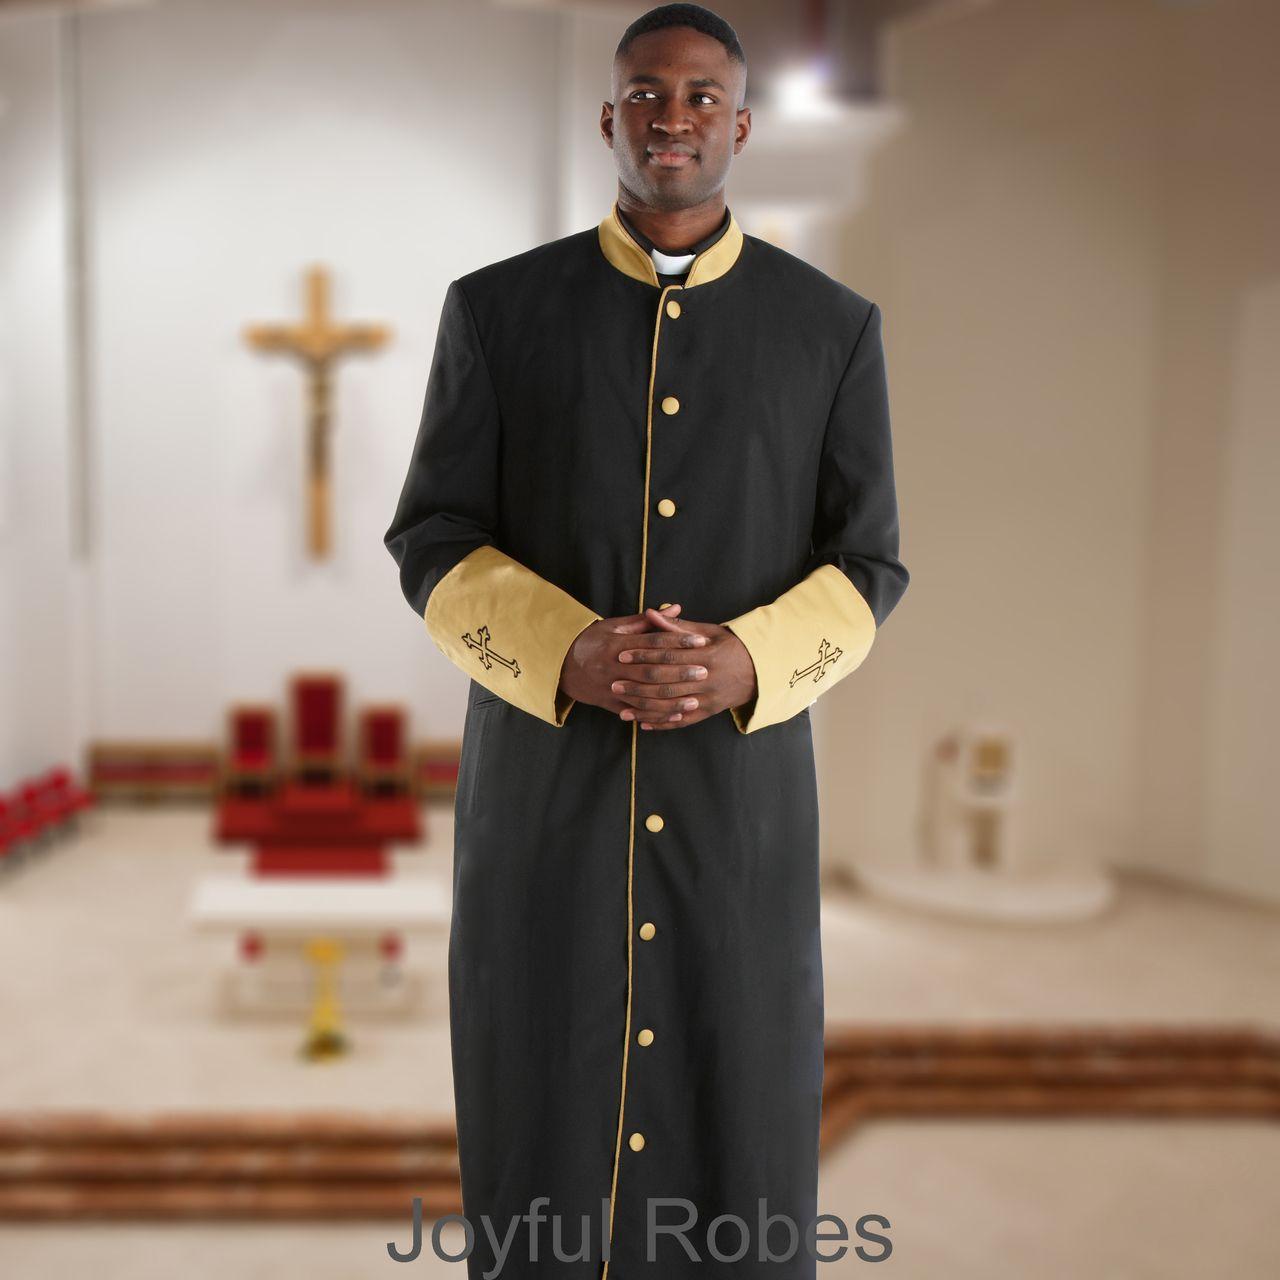 301 M. Men's Clergy/Pastor Robe Black/Gold Cuff